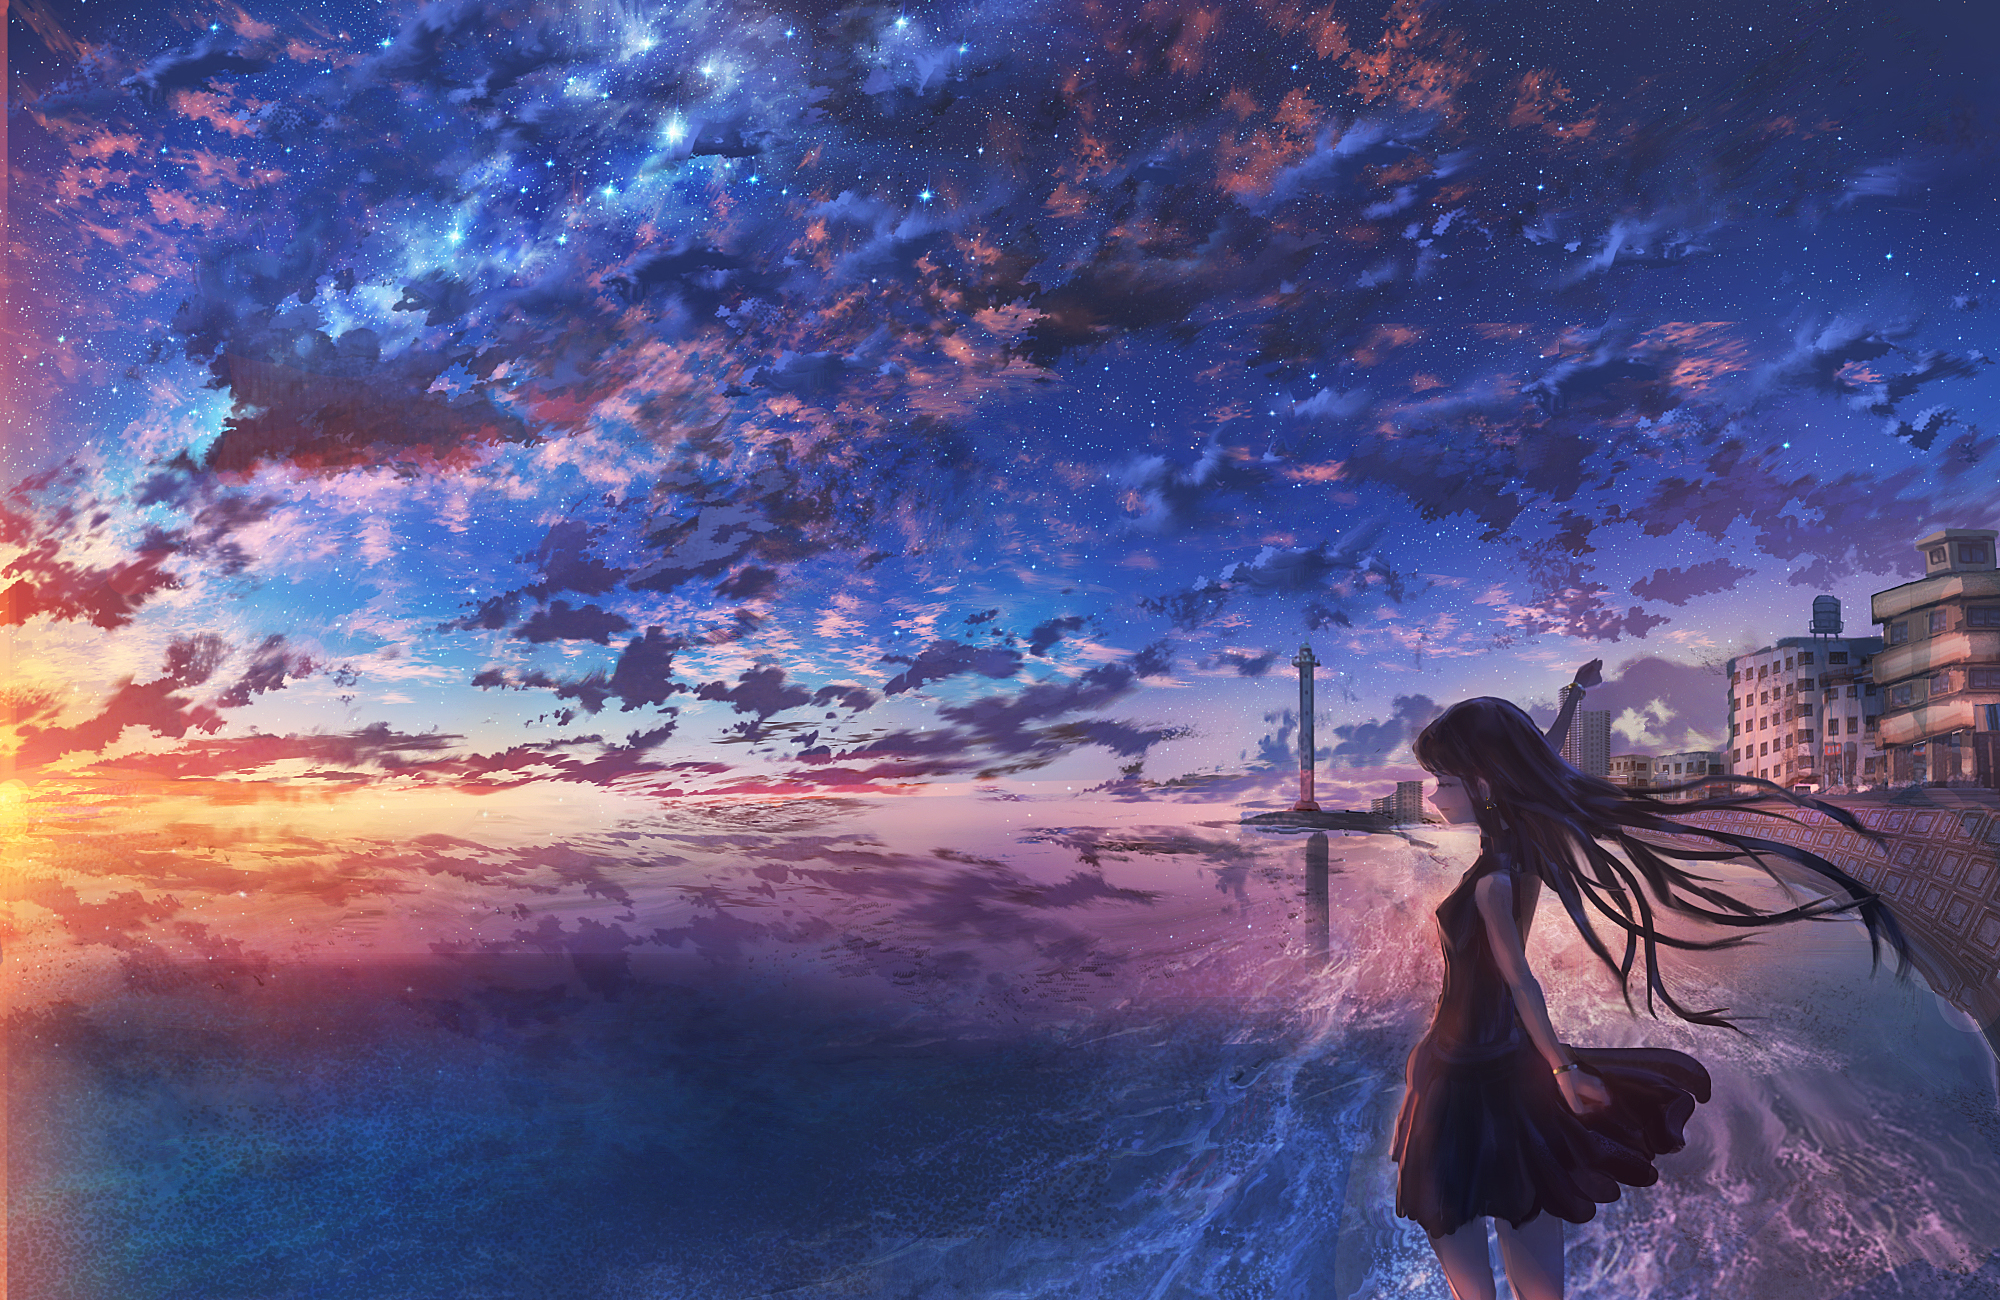 City Girl Horizon Ocean Starry Sky Sunset 2000x1300